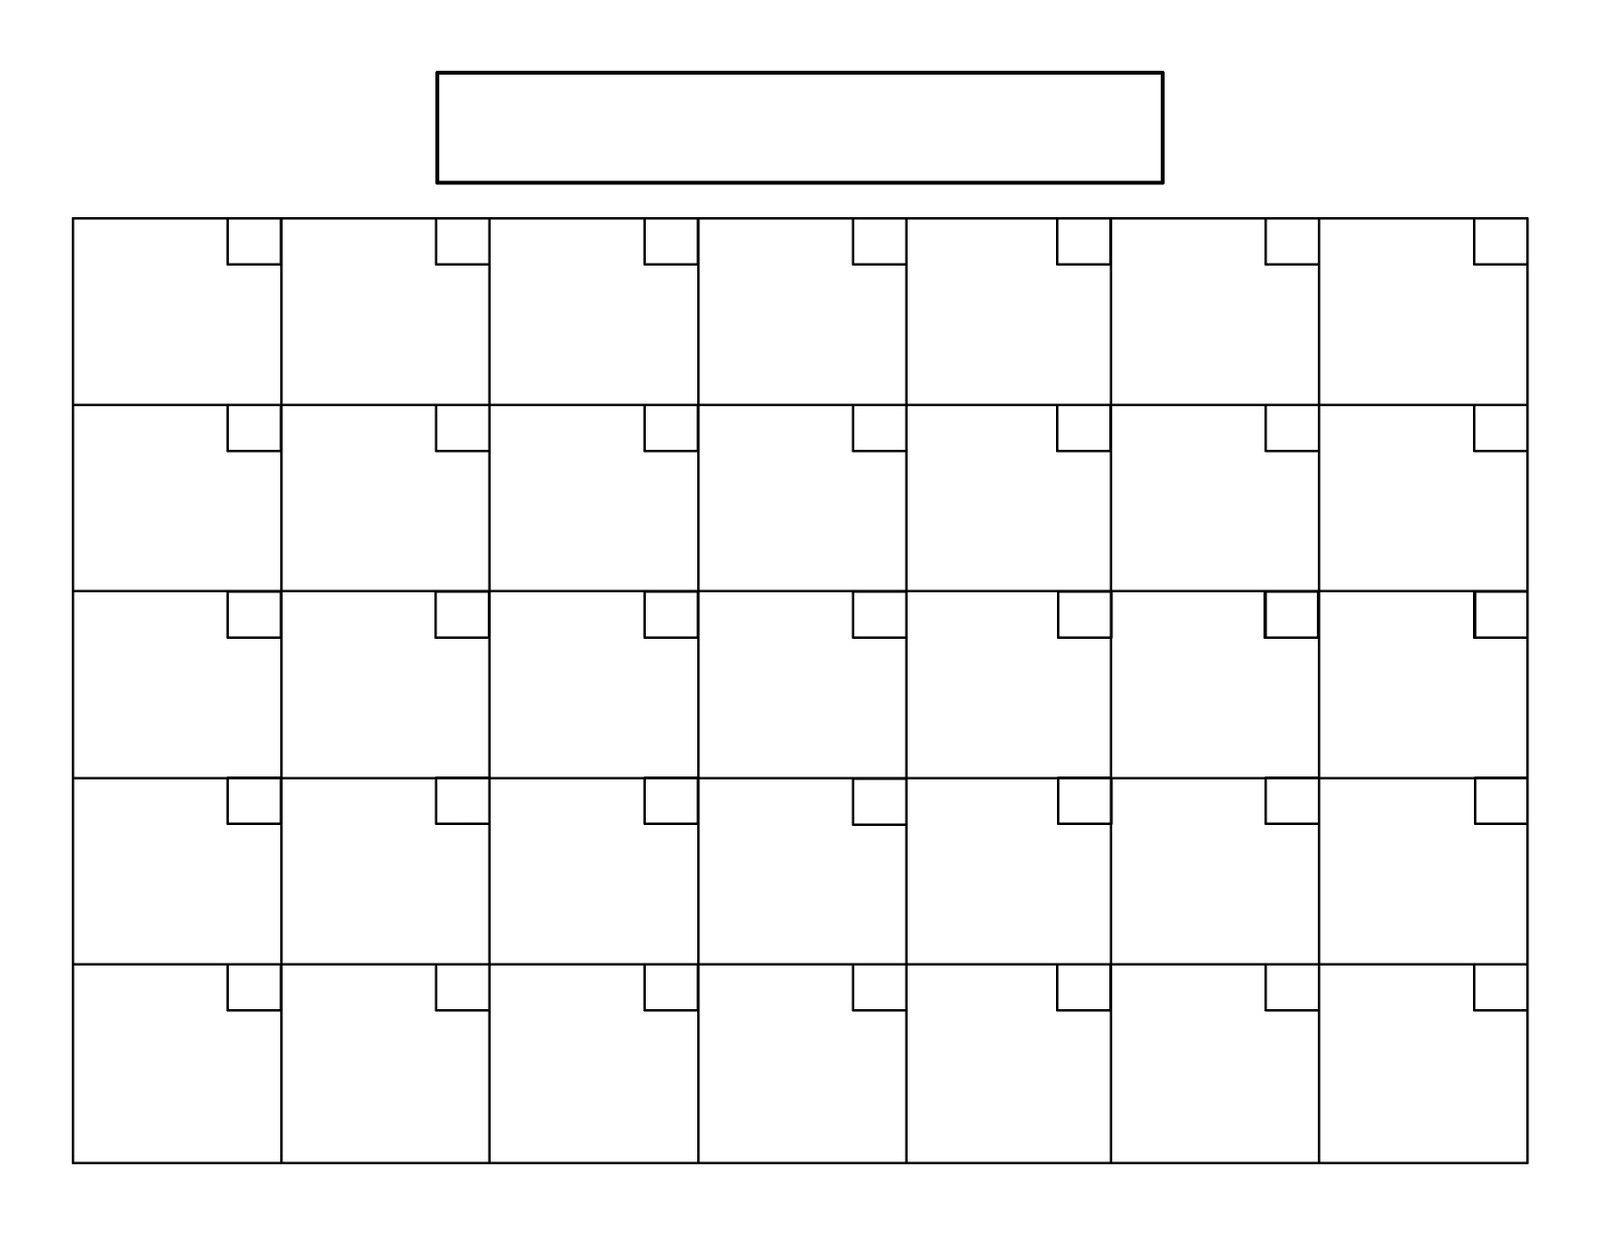 Printable 5 Day Calendar | Printable Blank Calendar, Blank with 5 Day Monthly Calendar